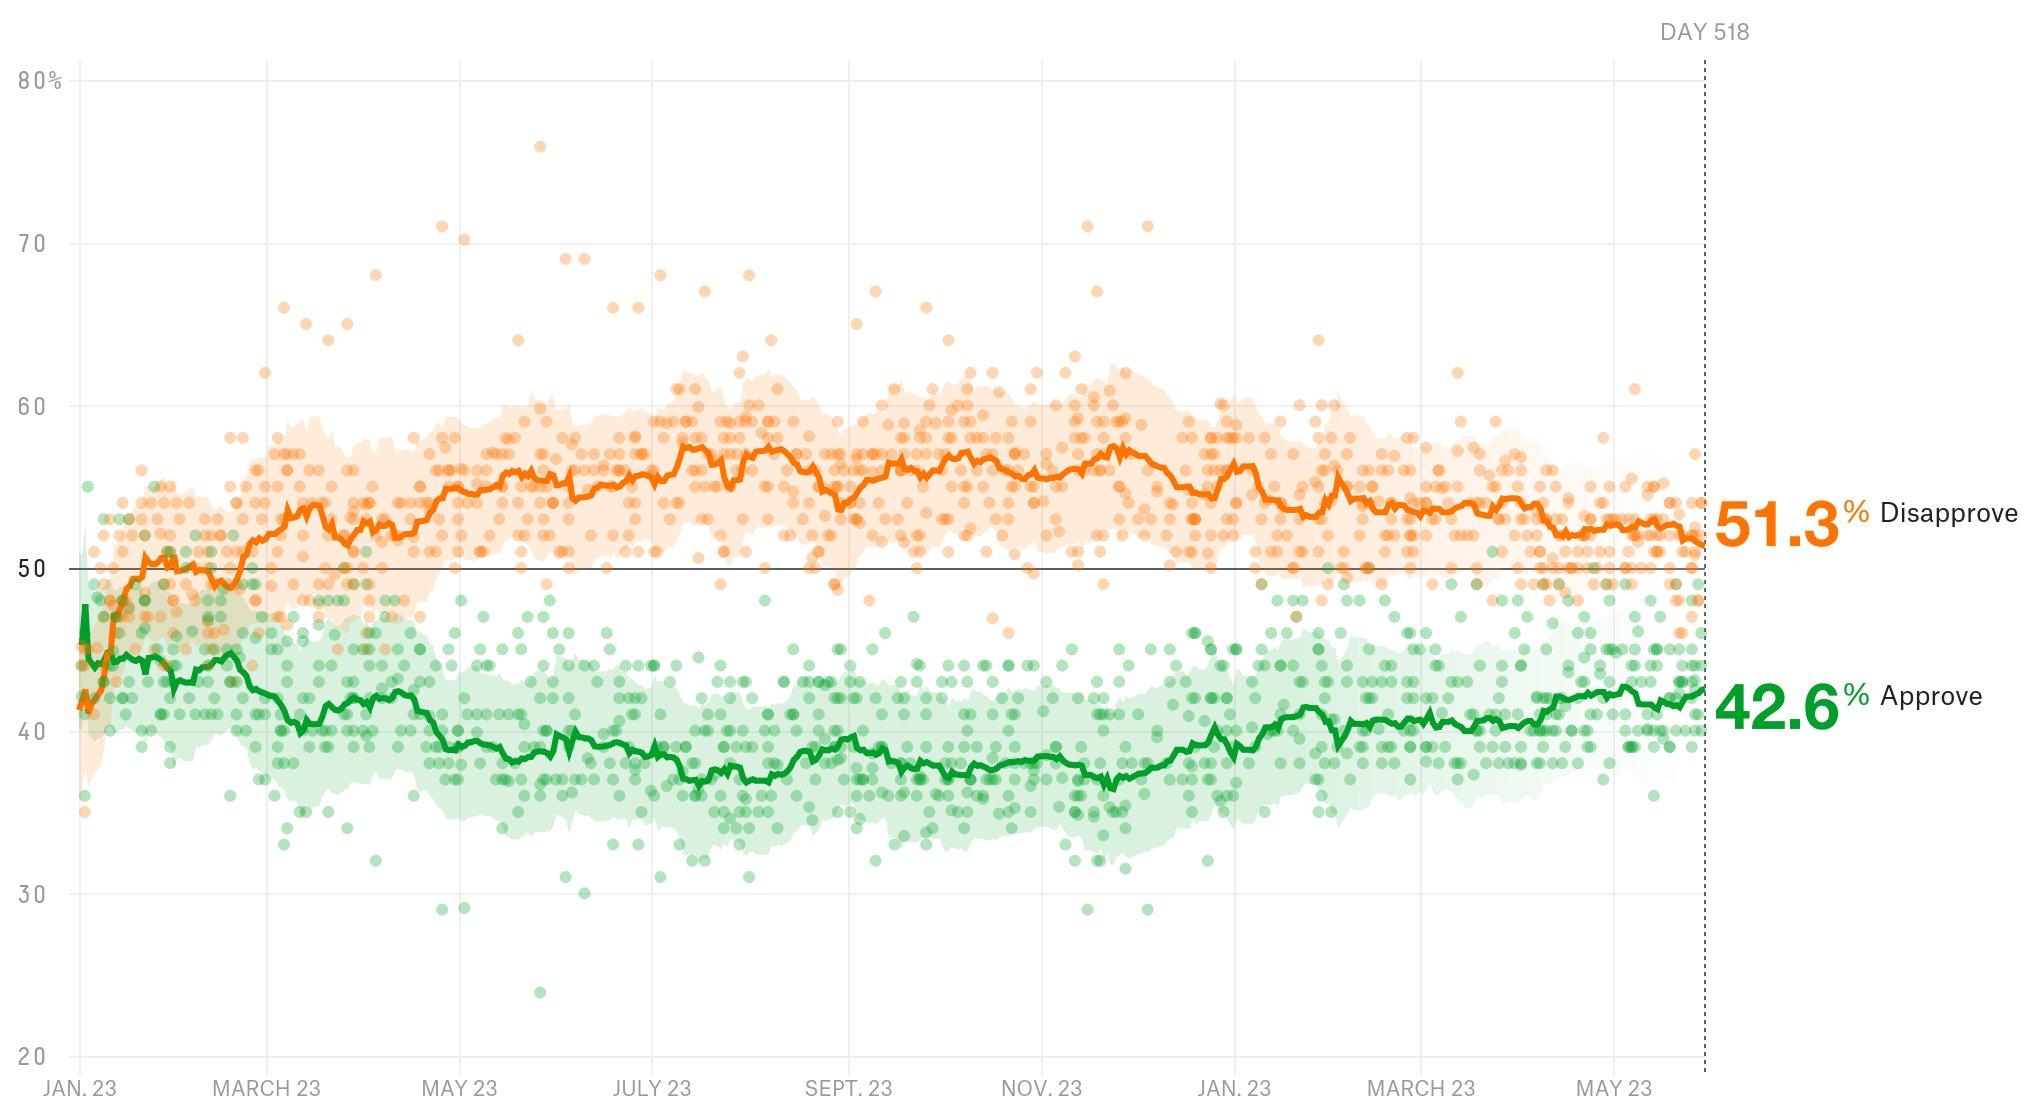 President Donald Trump has a 42.6% approval rating. https://t.co/gFuJdJjGOg https://t.co/OwOsshhLzt